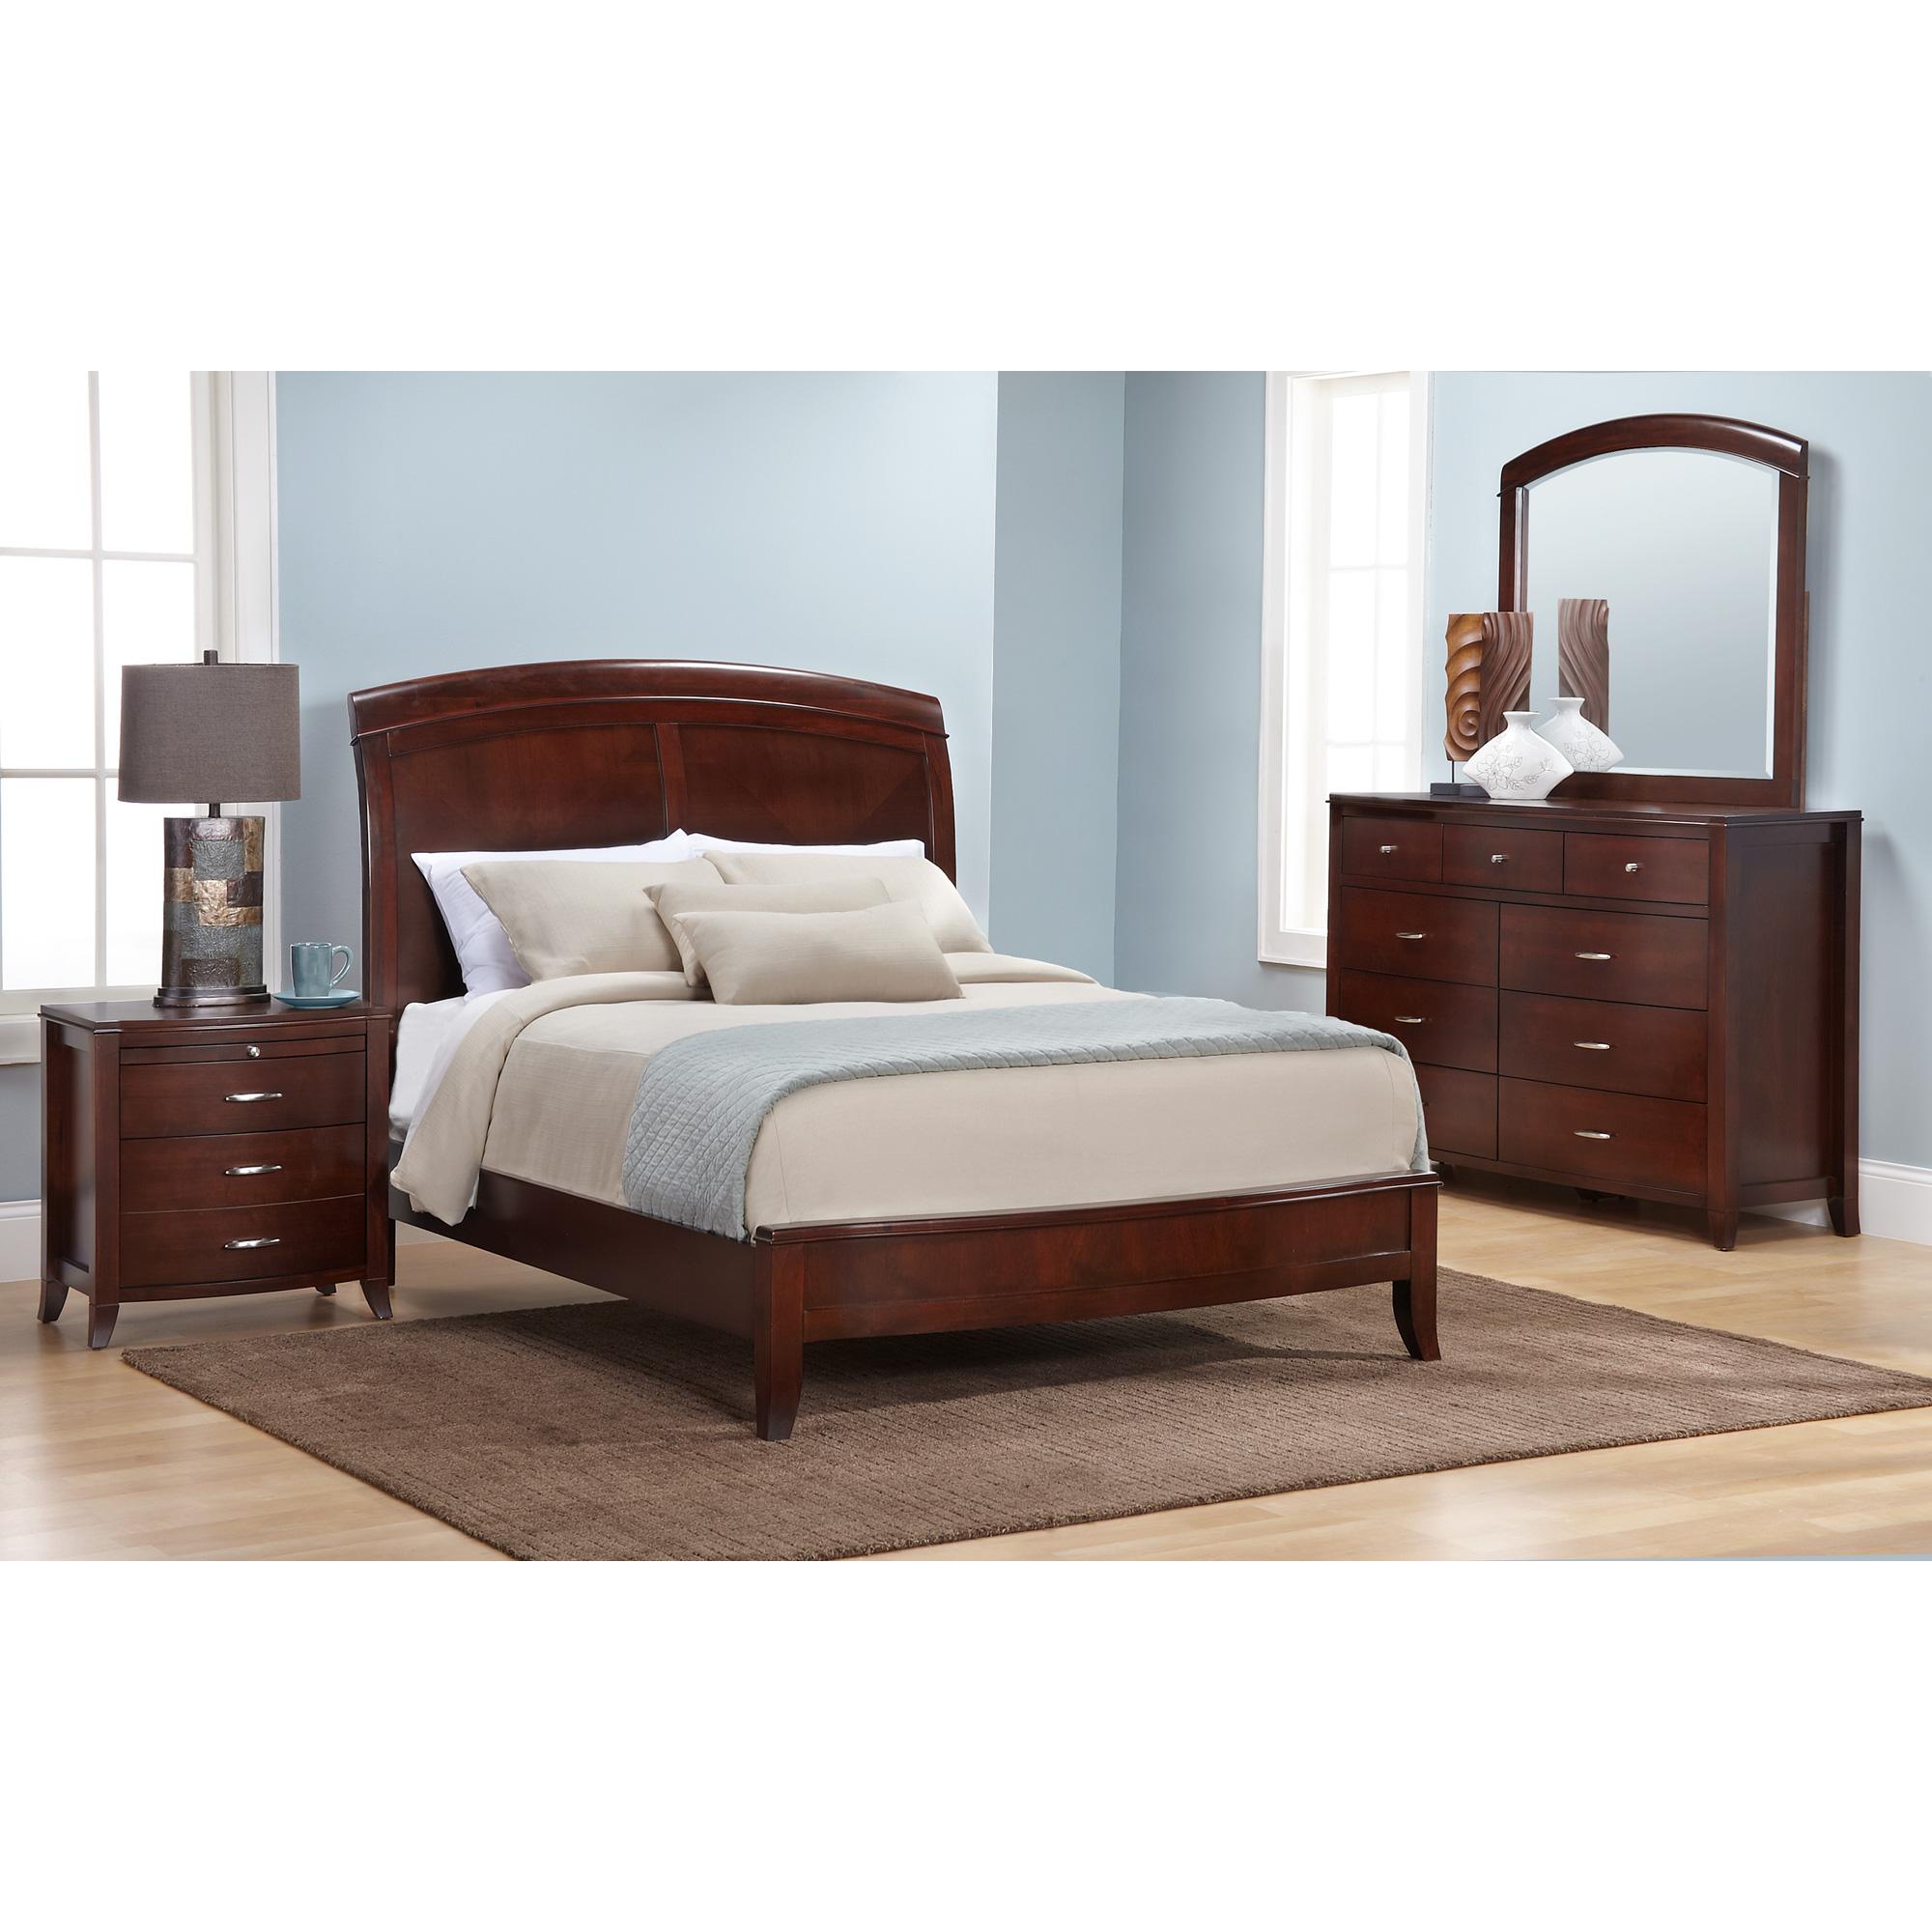 Modus Furniture International | Brighton Cinnamon Full 4 Piece Room Group Bedroom Set | Mahogany